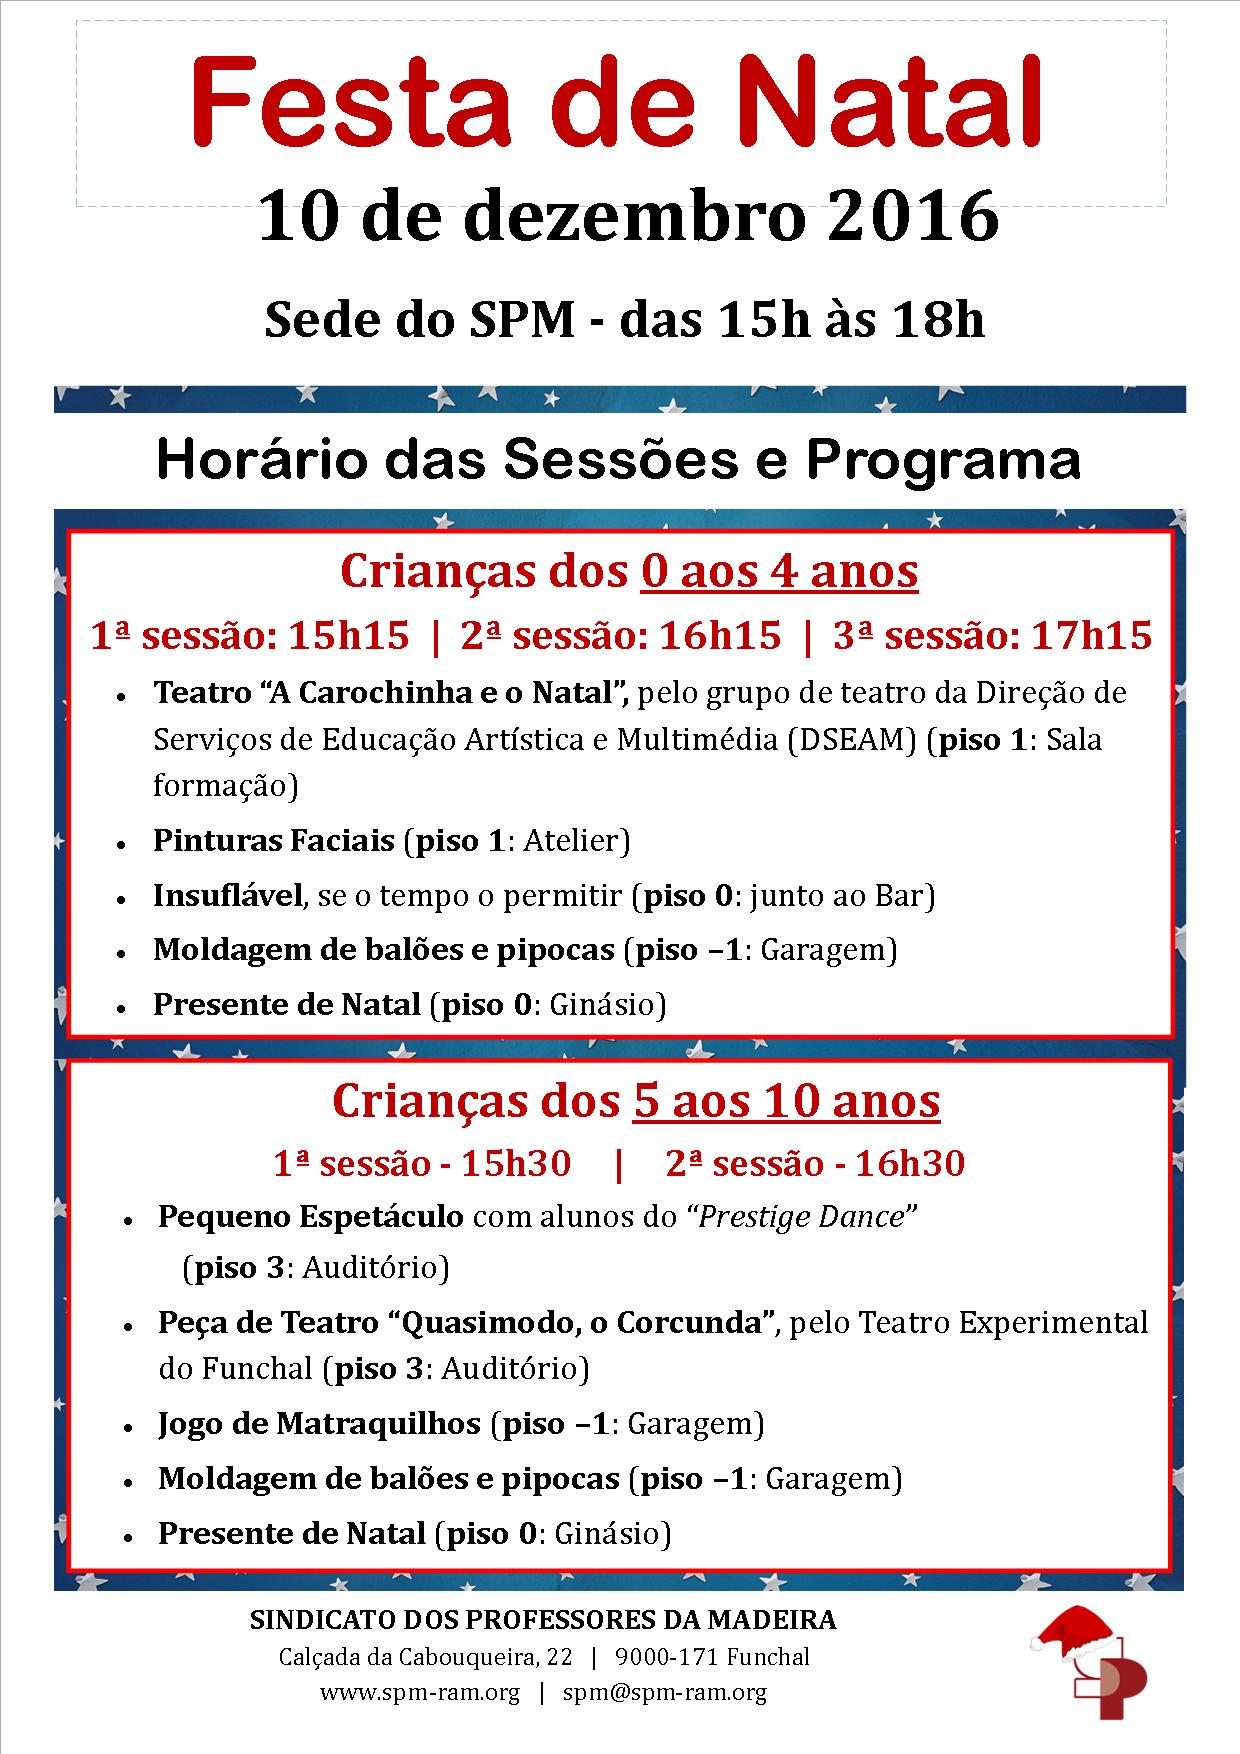 horario-sessoes-e-programa-festa-natal-2016